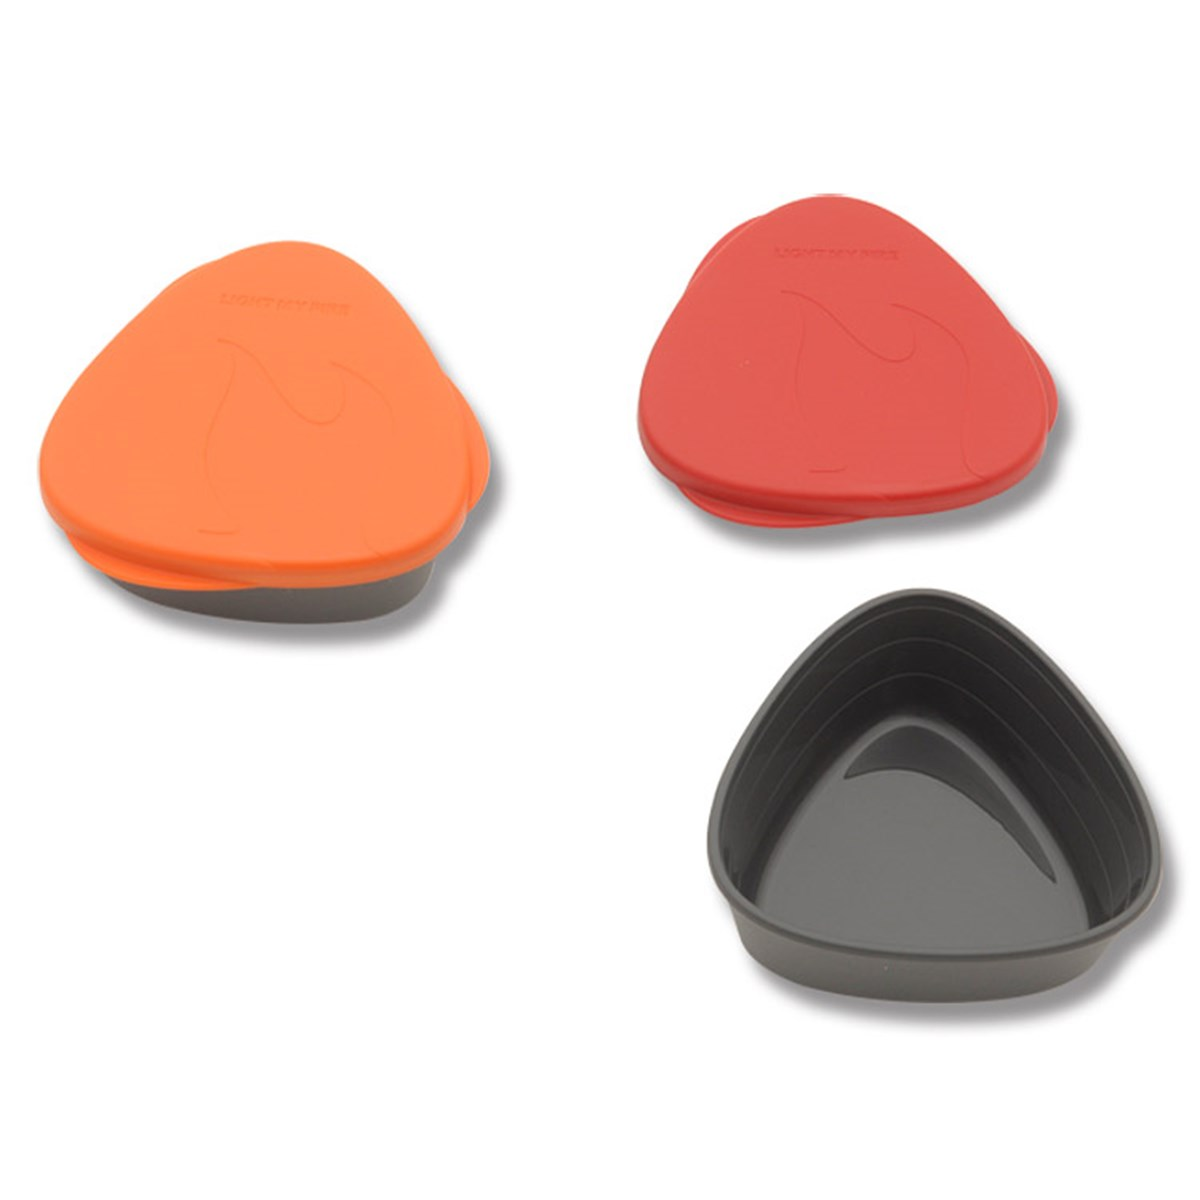 Lmf snapbox red/orange